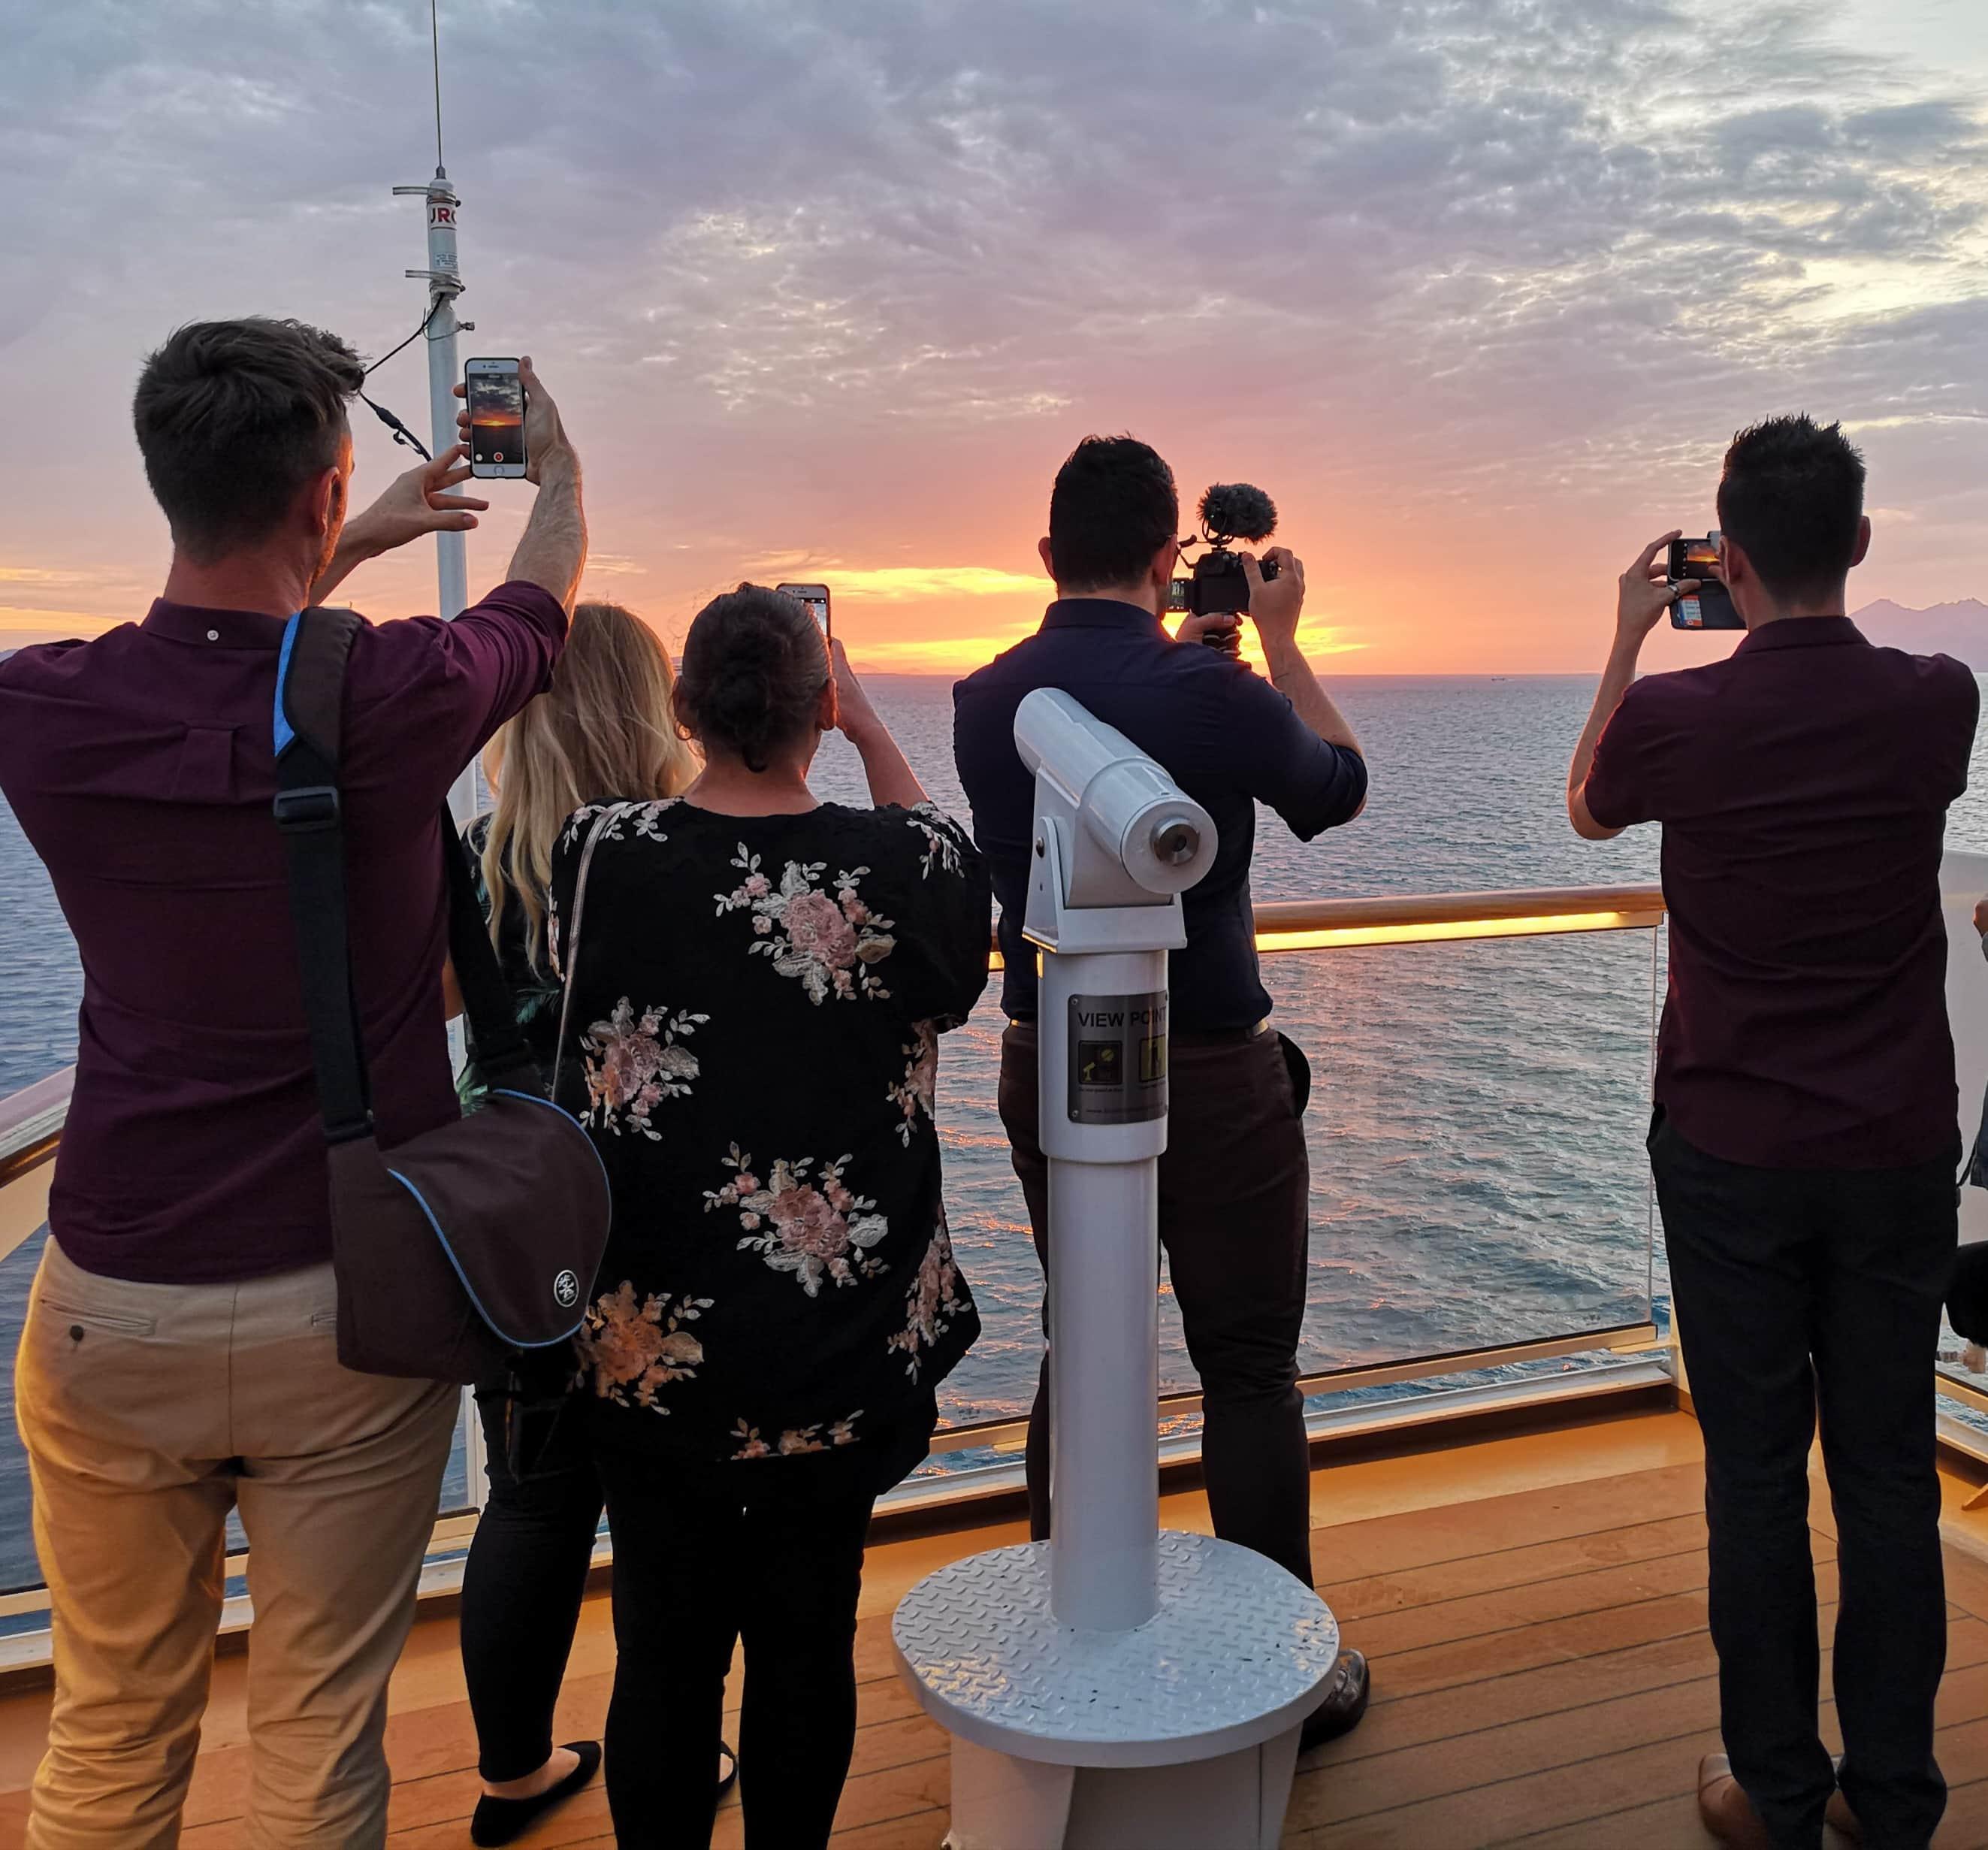 Viking Cruises Sea - Midnight Sun - Tromso - Taking pictures of sunset